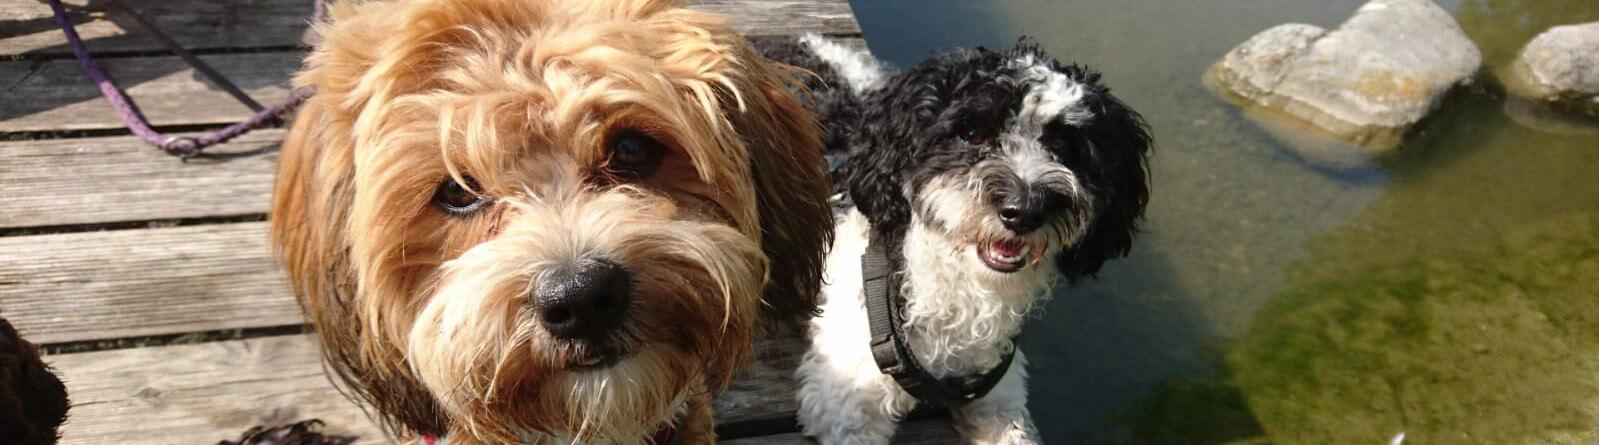 Teddy und Snoopy Huta München